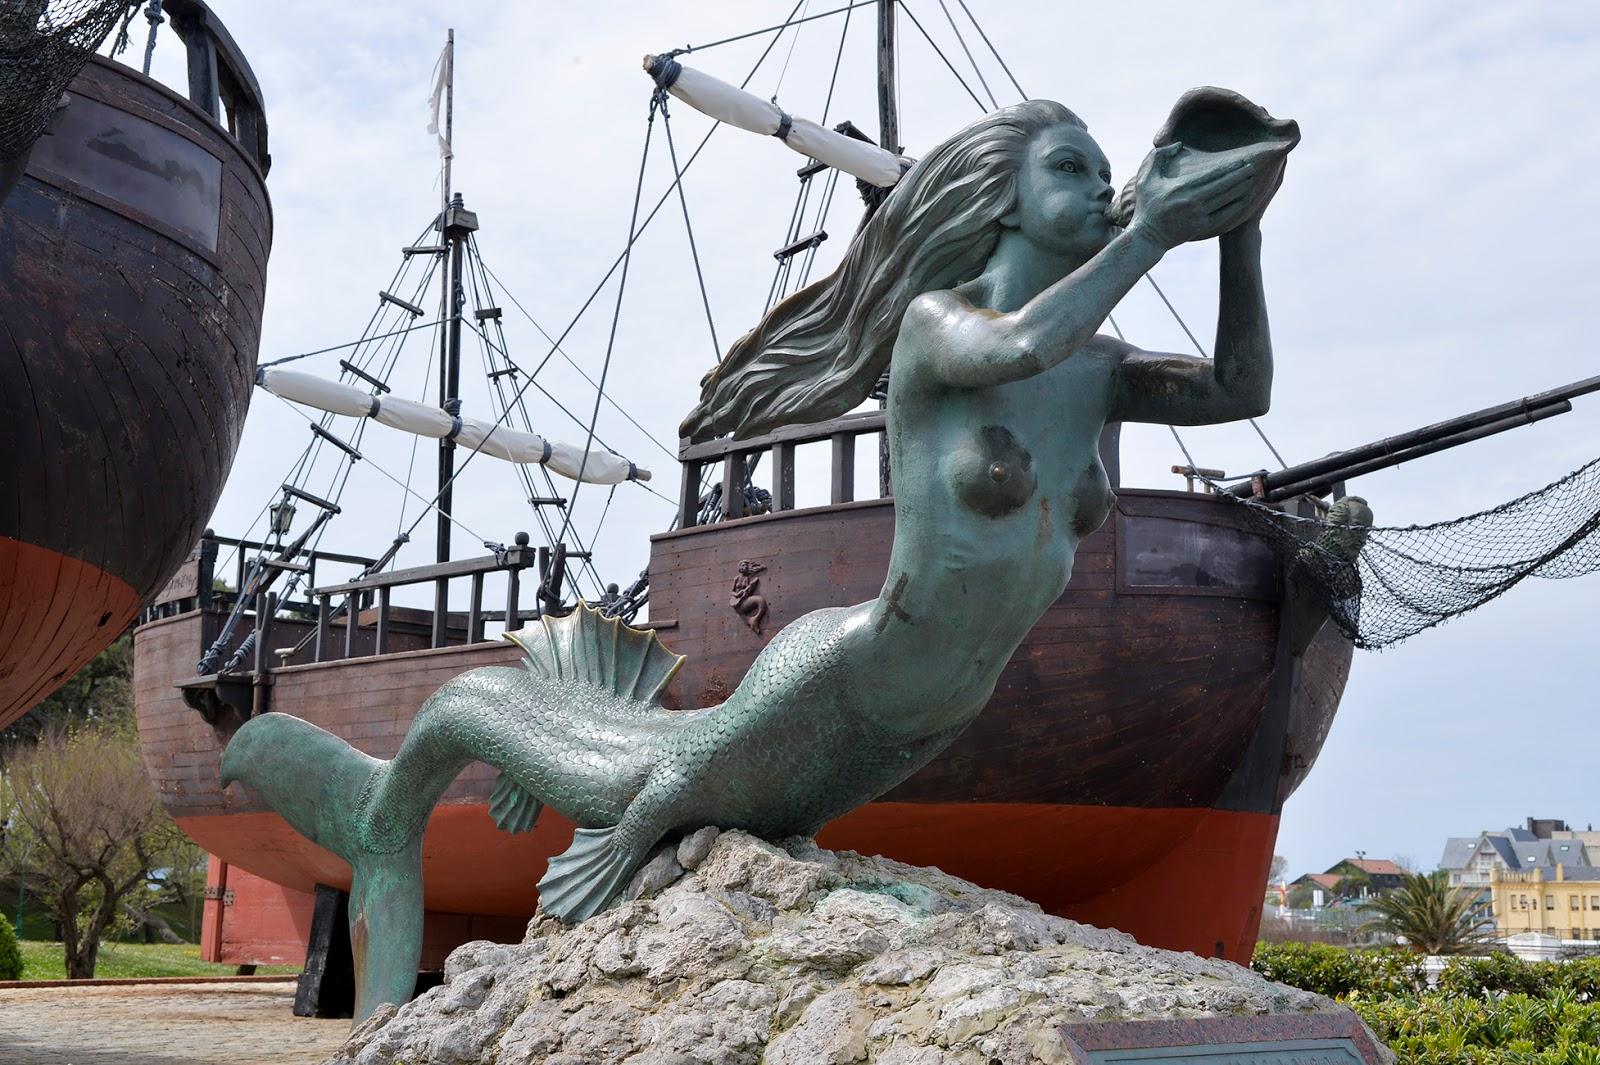 ship mermaid carabela sirena santander sardinero cantabria